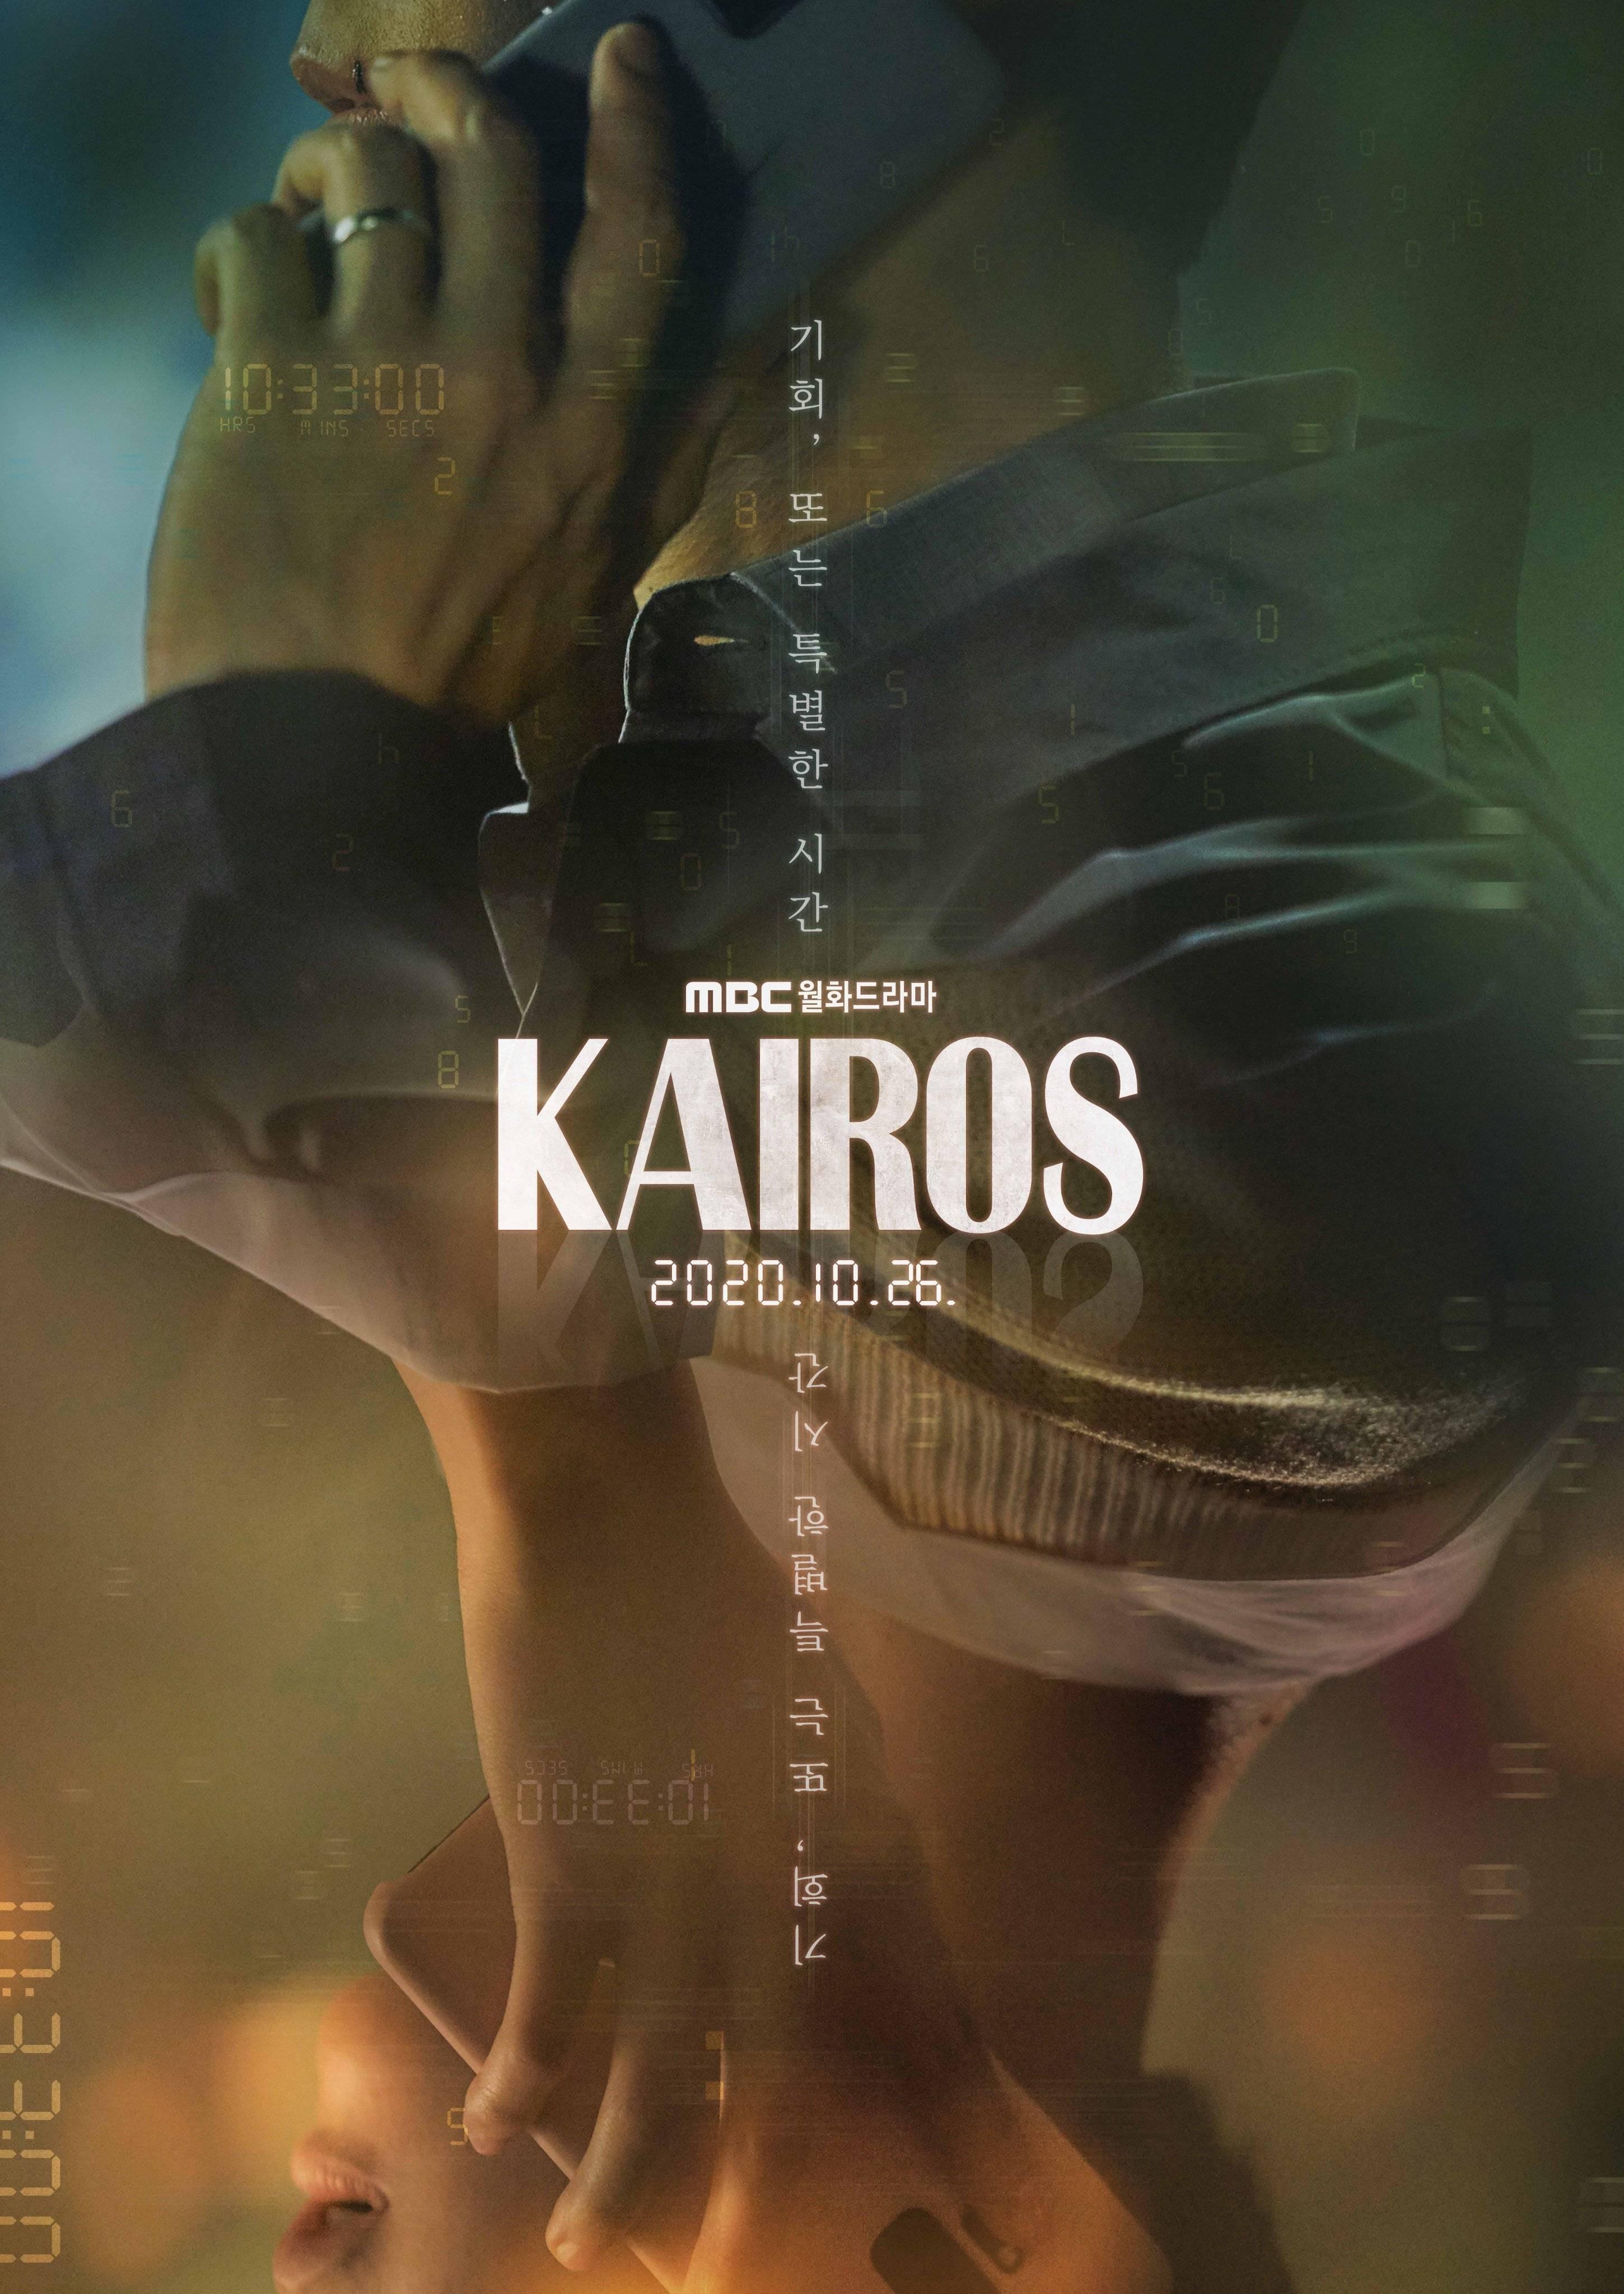 Kairos Prepare for the second half!